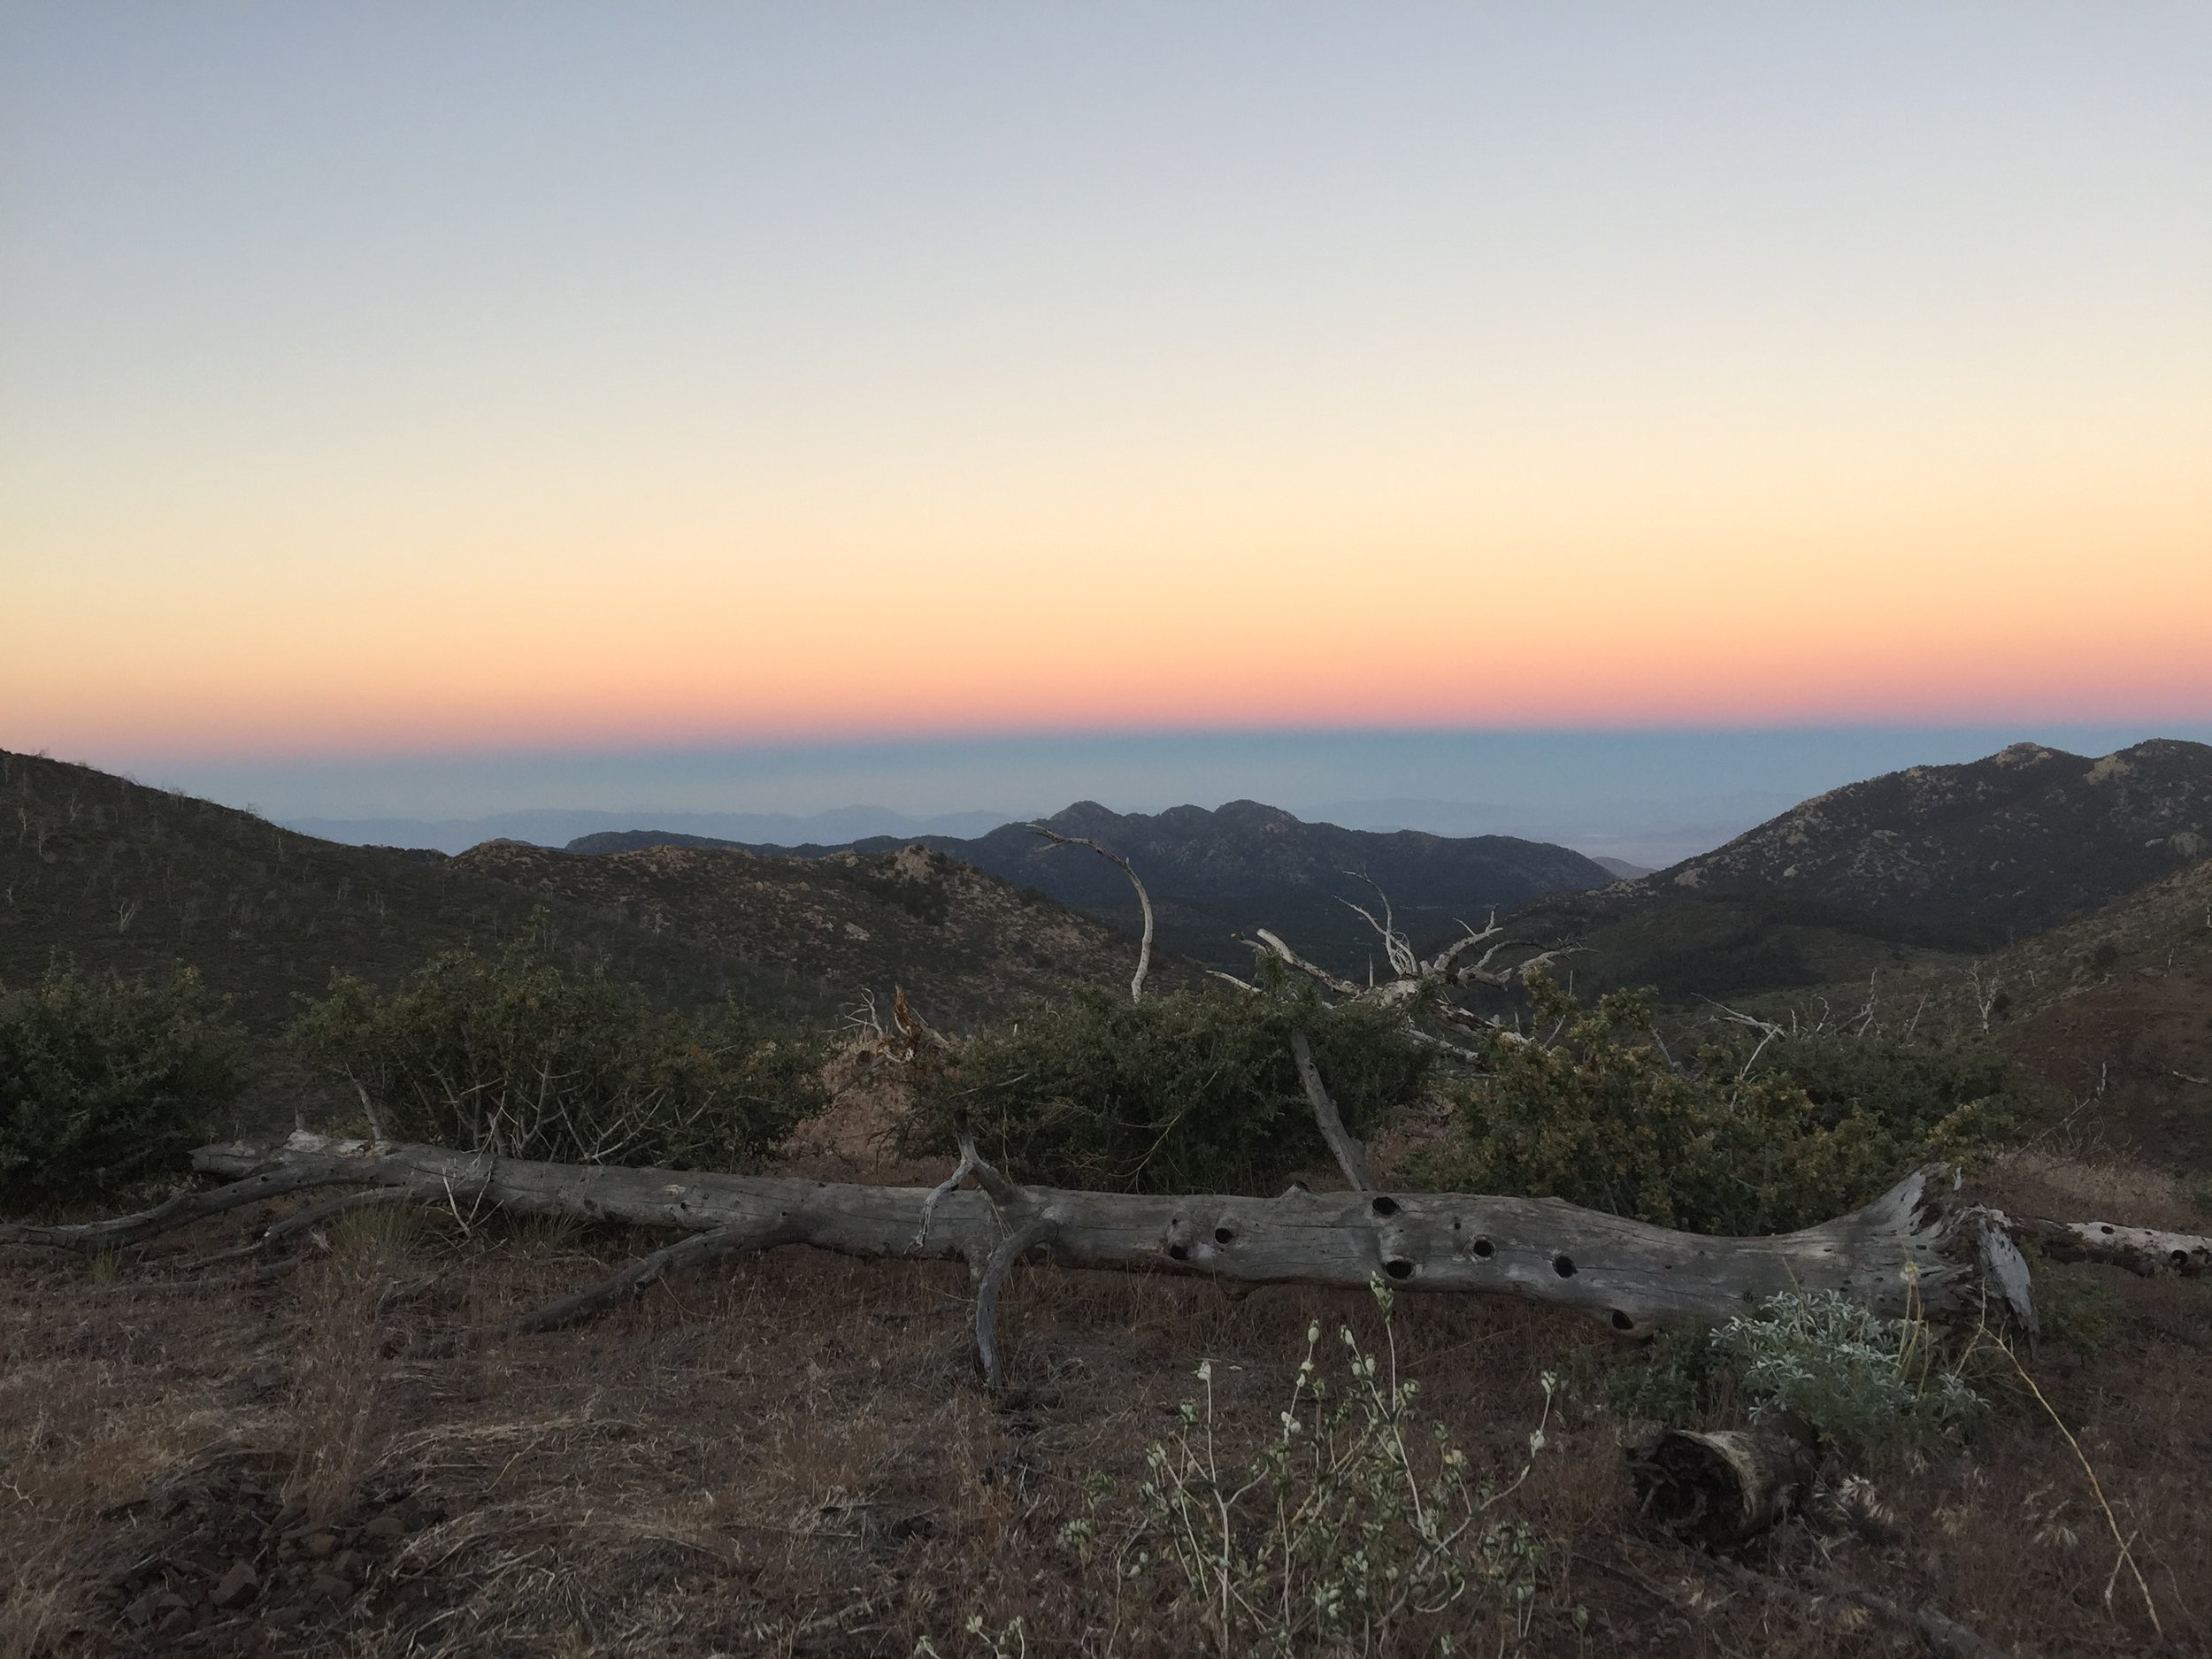 So long, SoCal sunsets